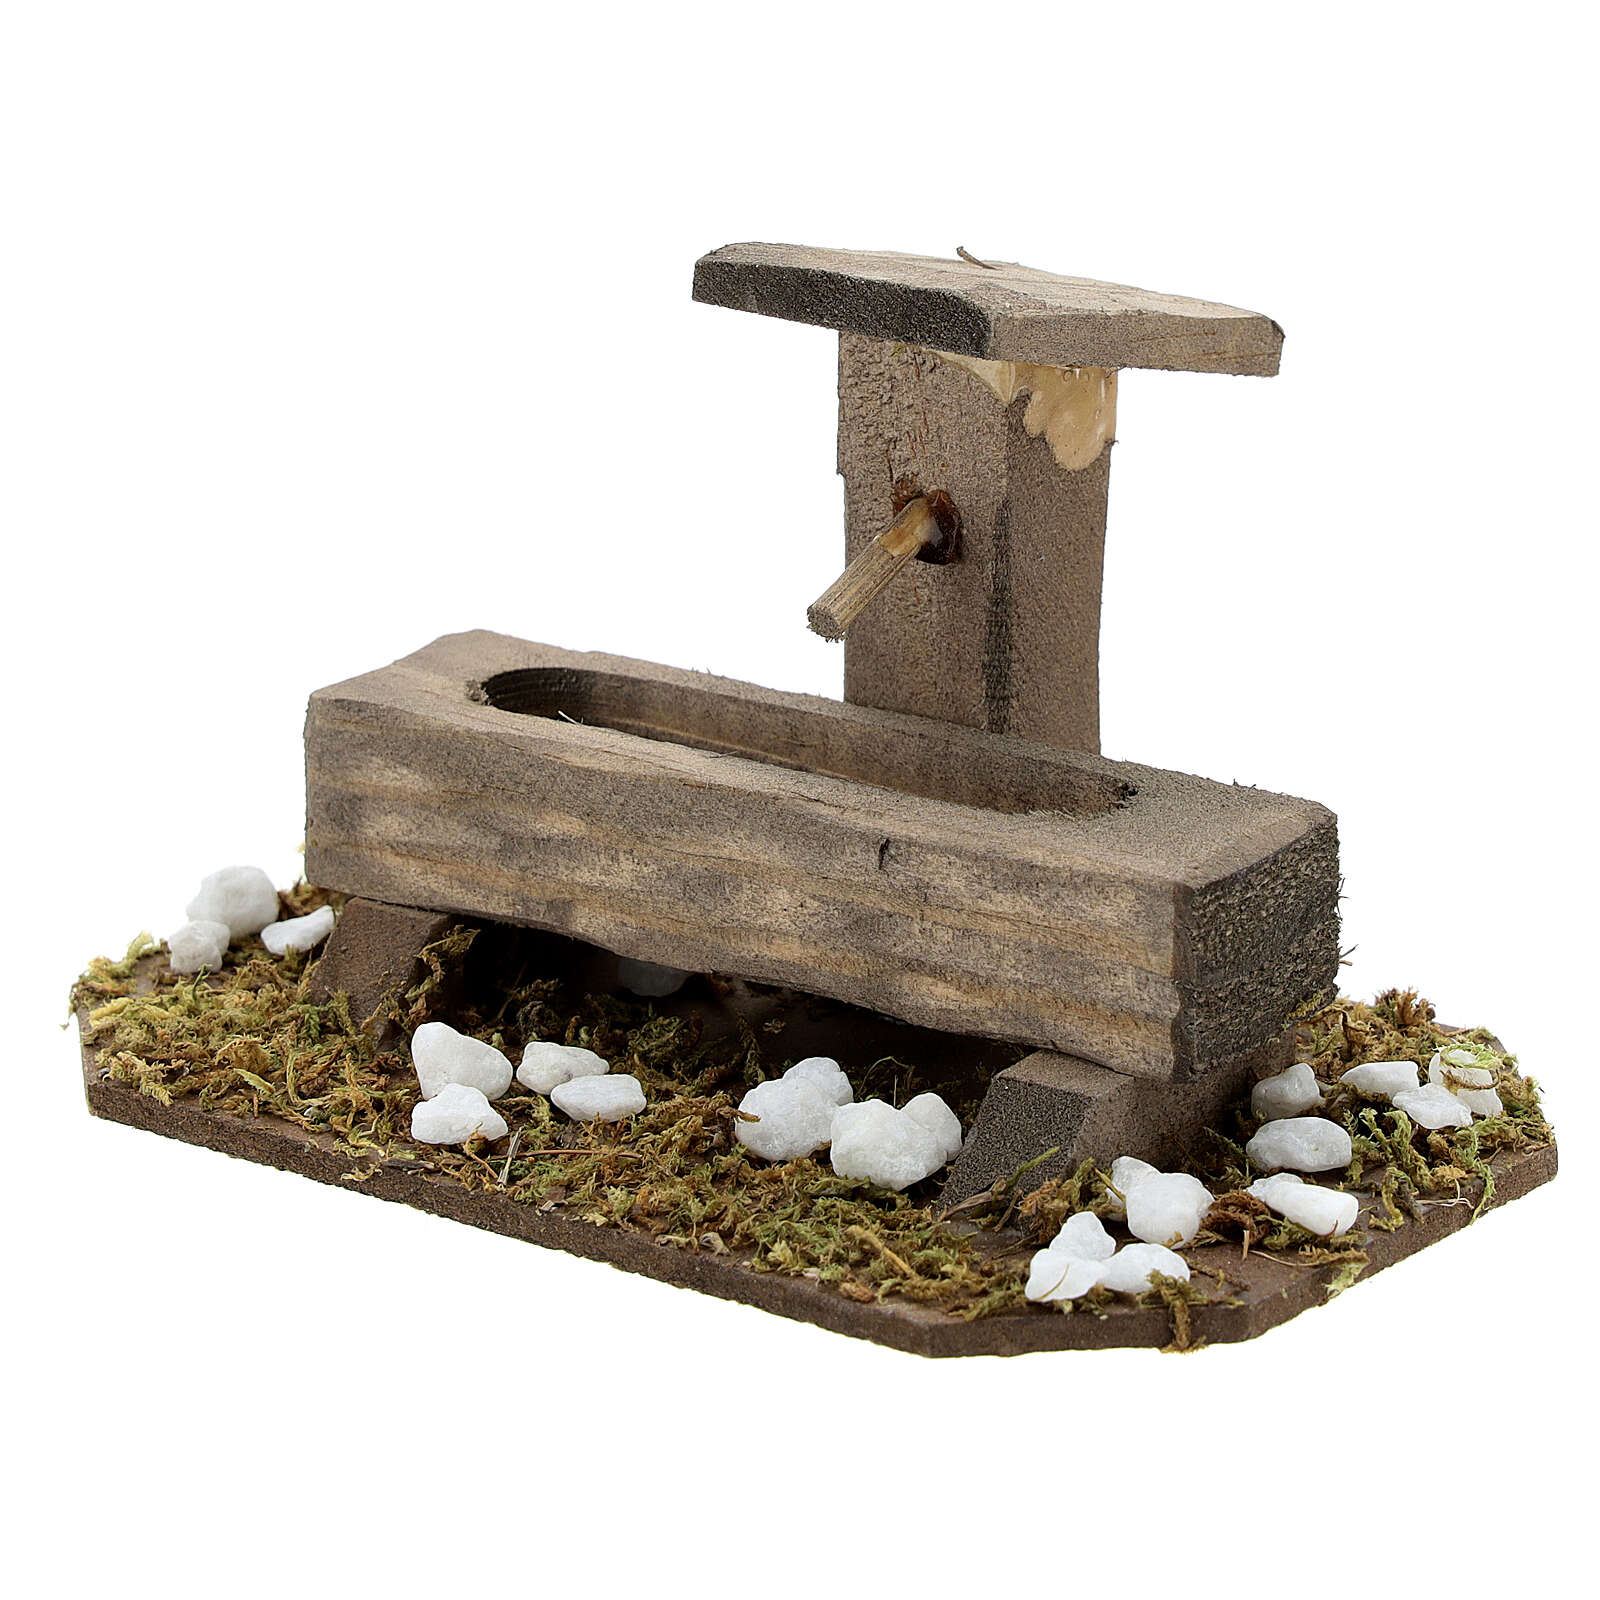 Fontana finta presepe 14-16 cm legno 10x10x5 cm 4